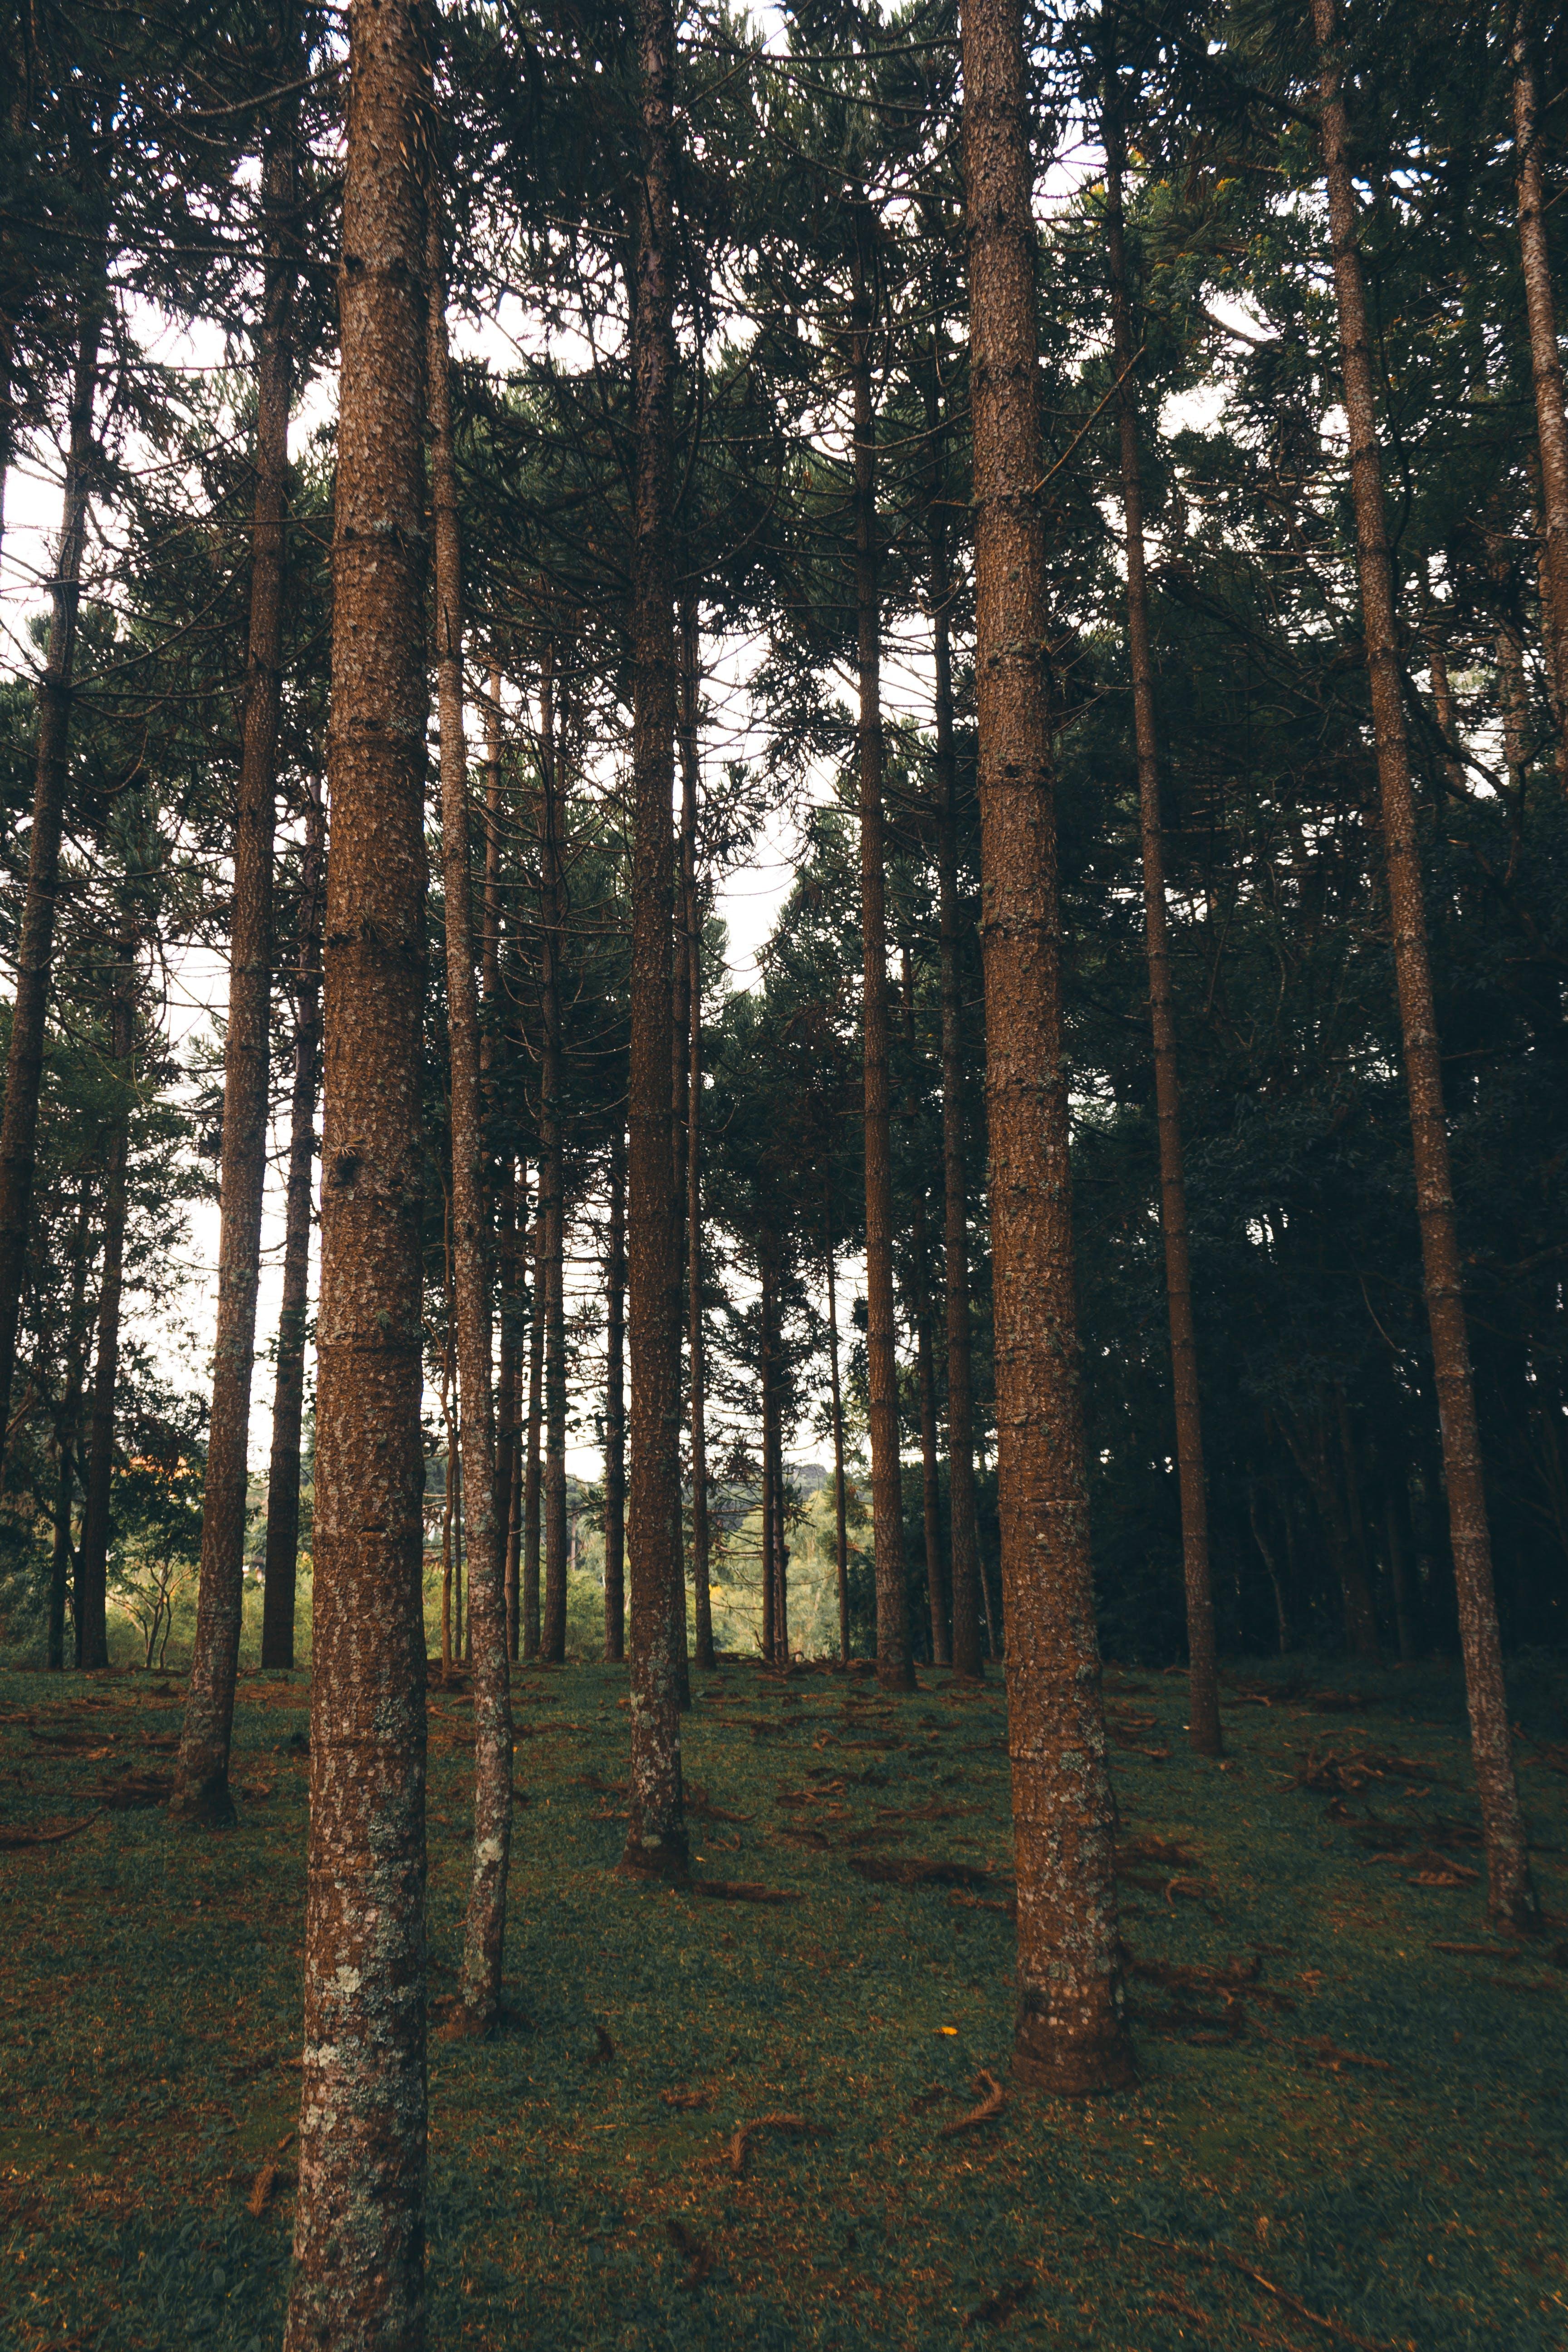 Foto stok gratis alam, batang, batang pohon, damai